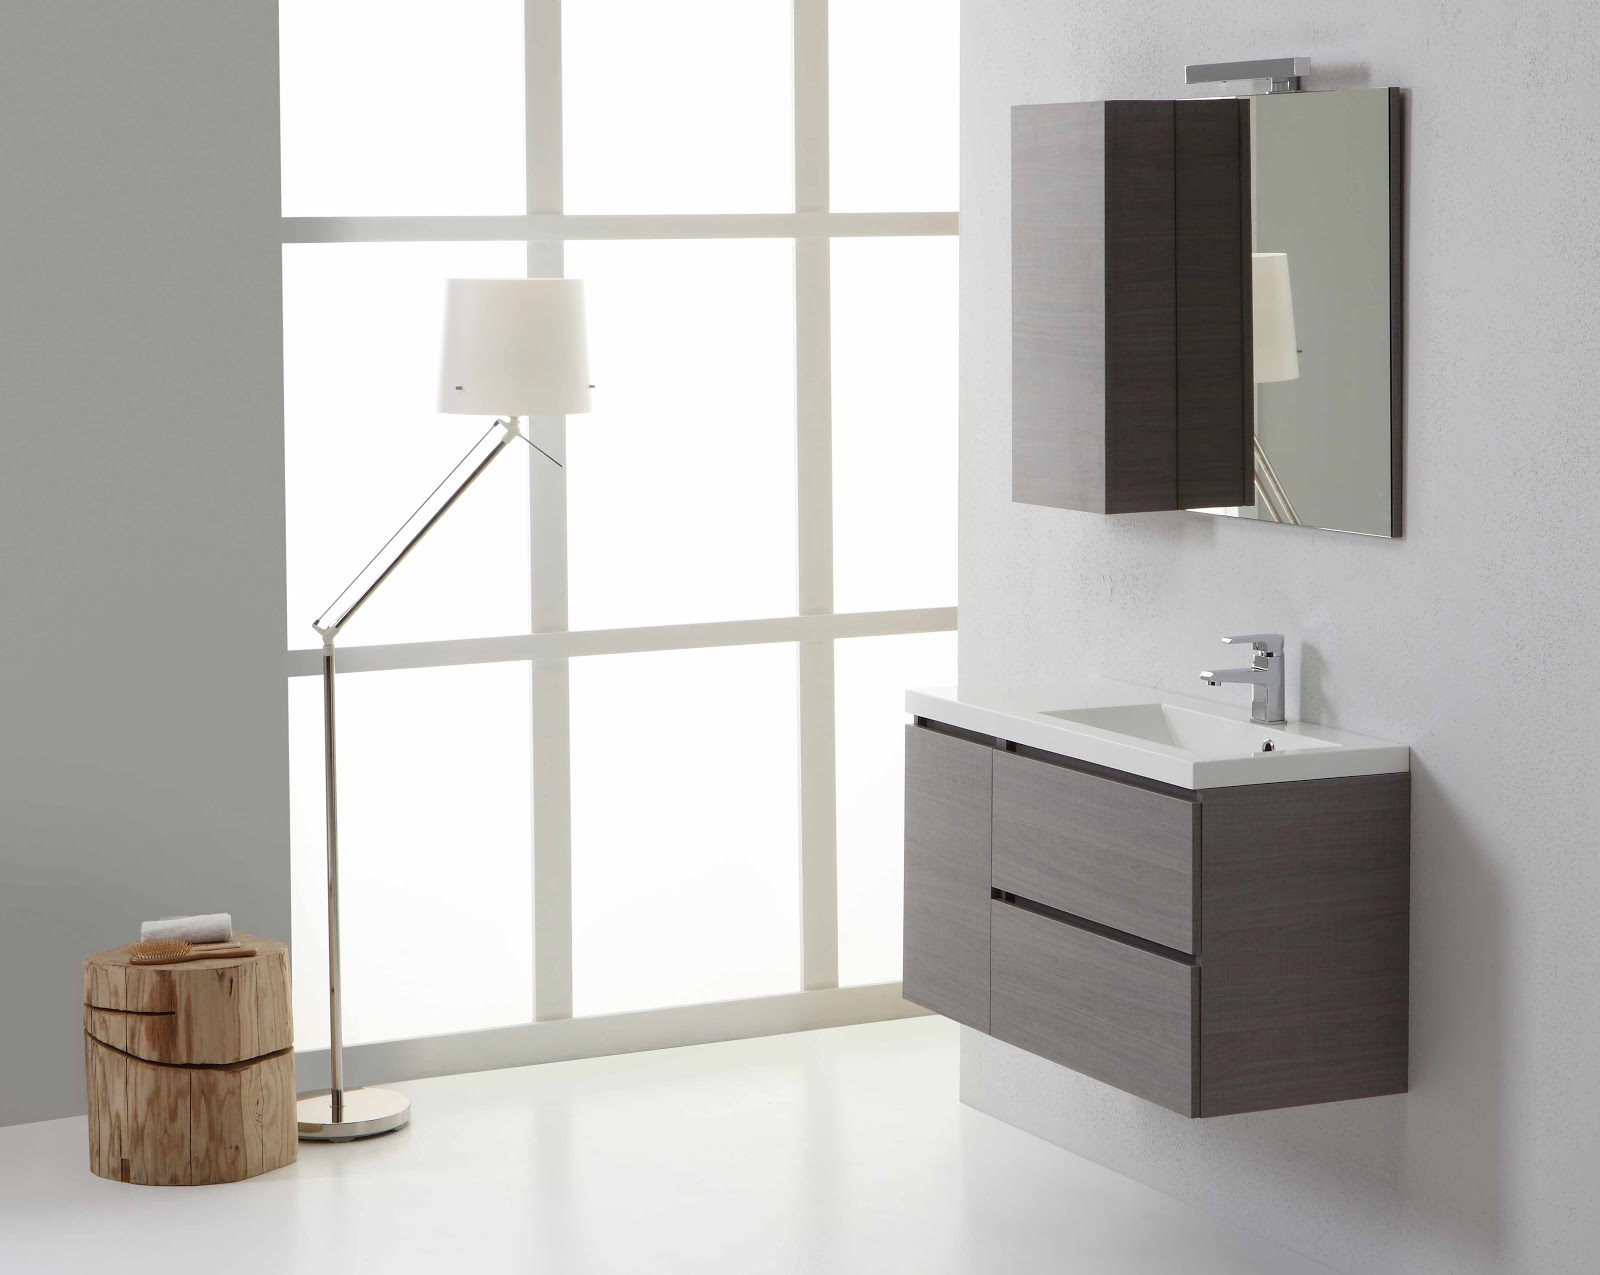 Corriere del web mobili bagno moderni by kv store for Mobili bagno moderni